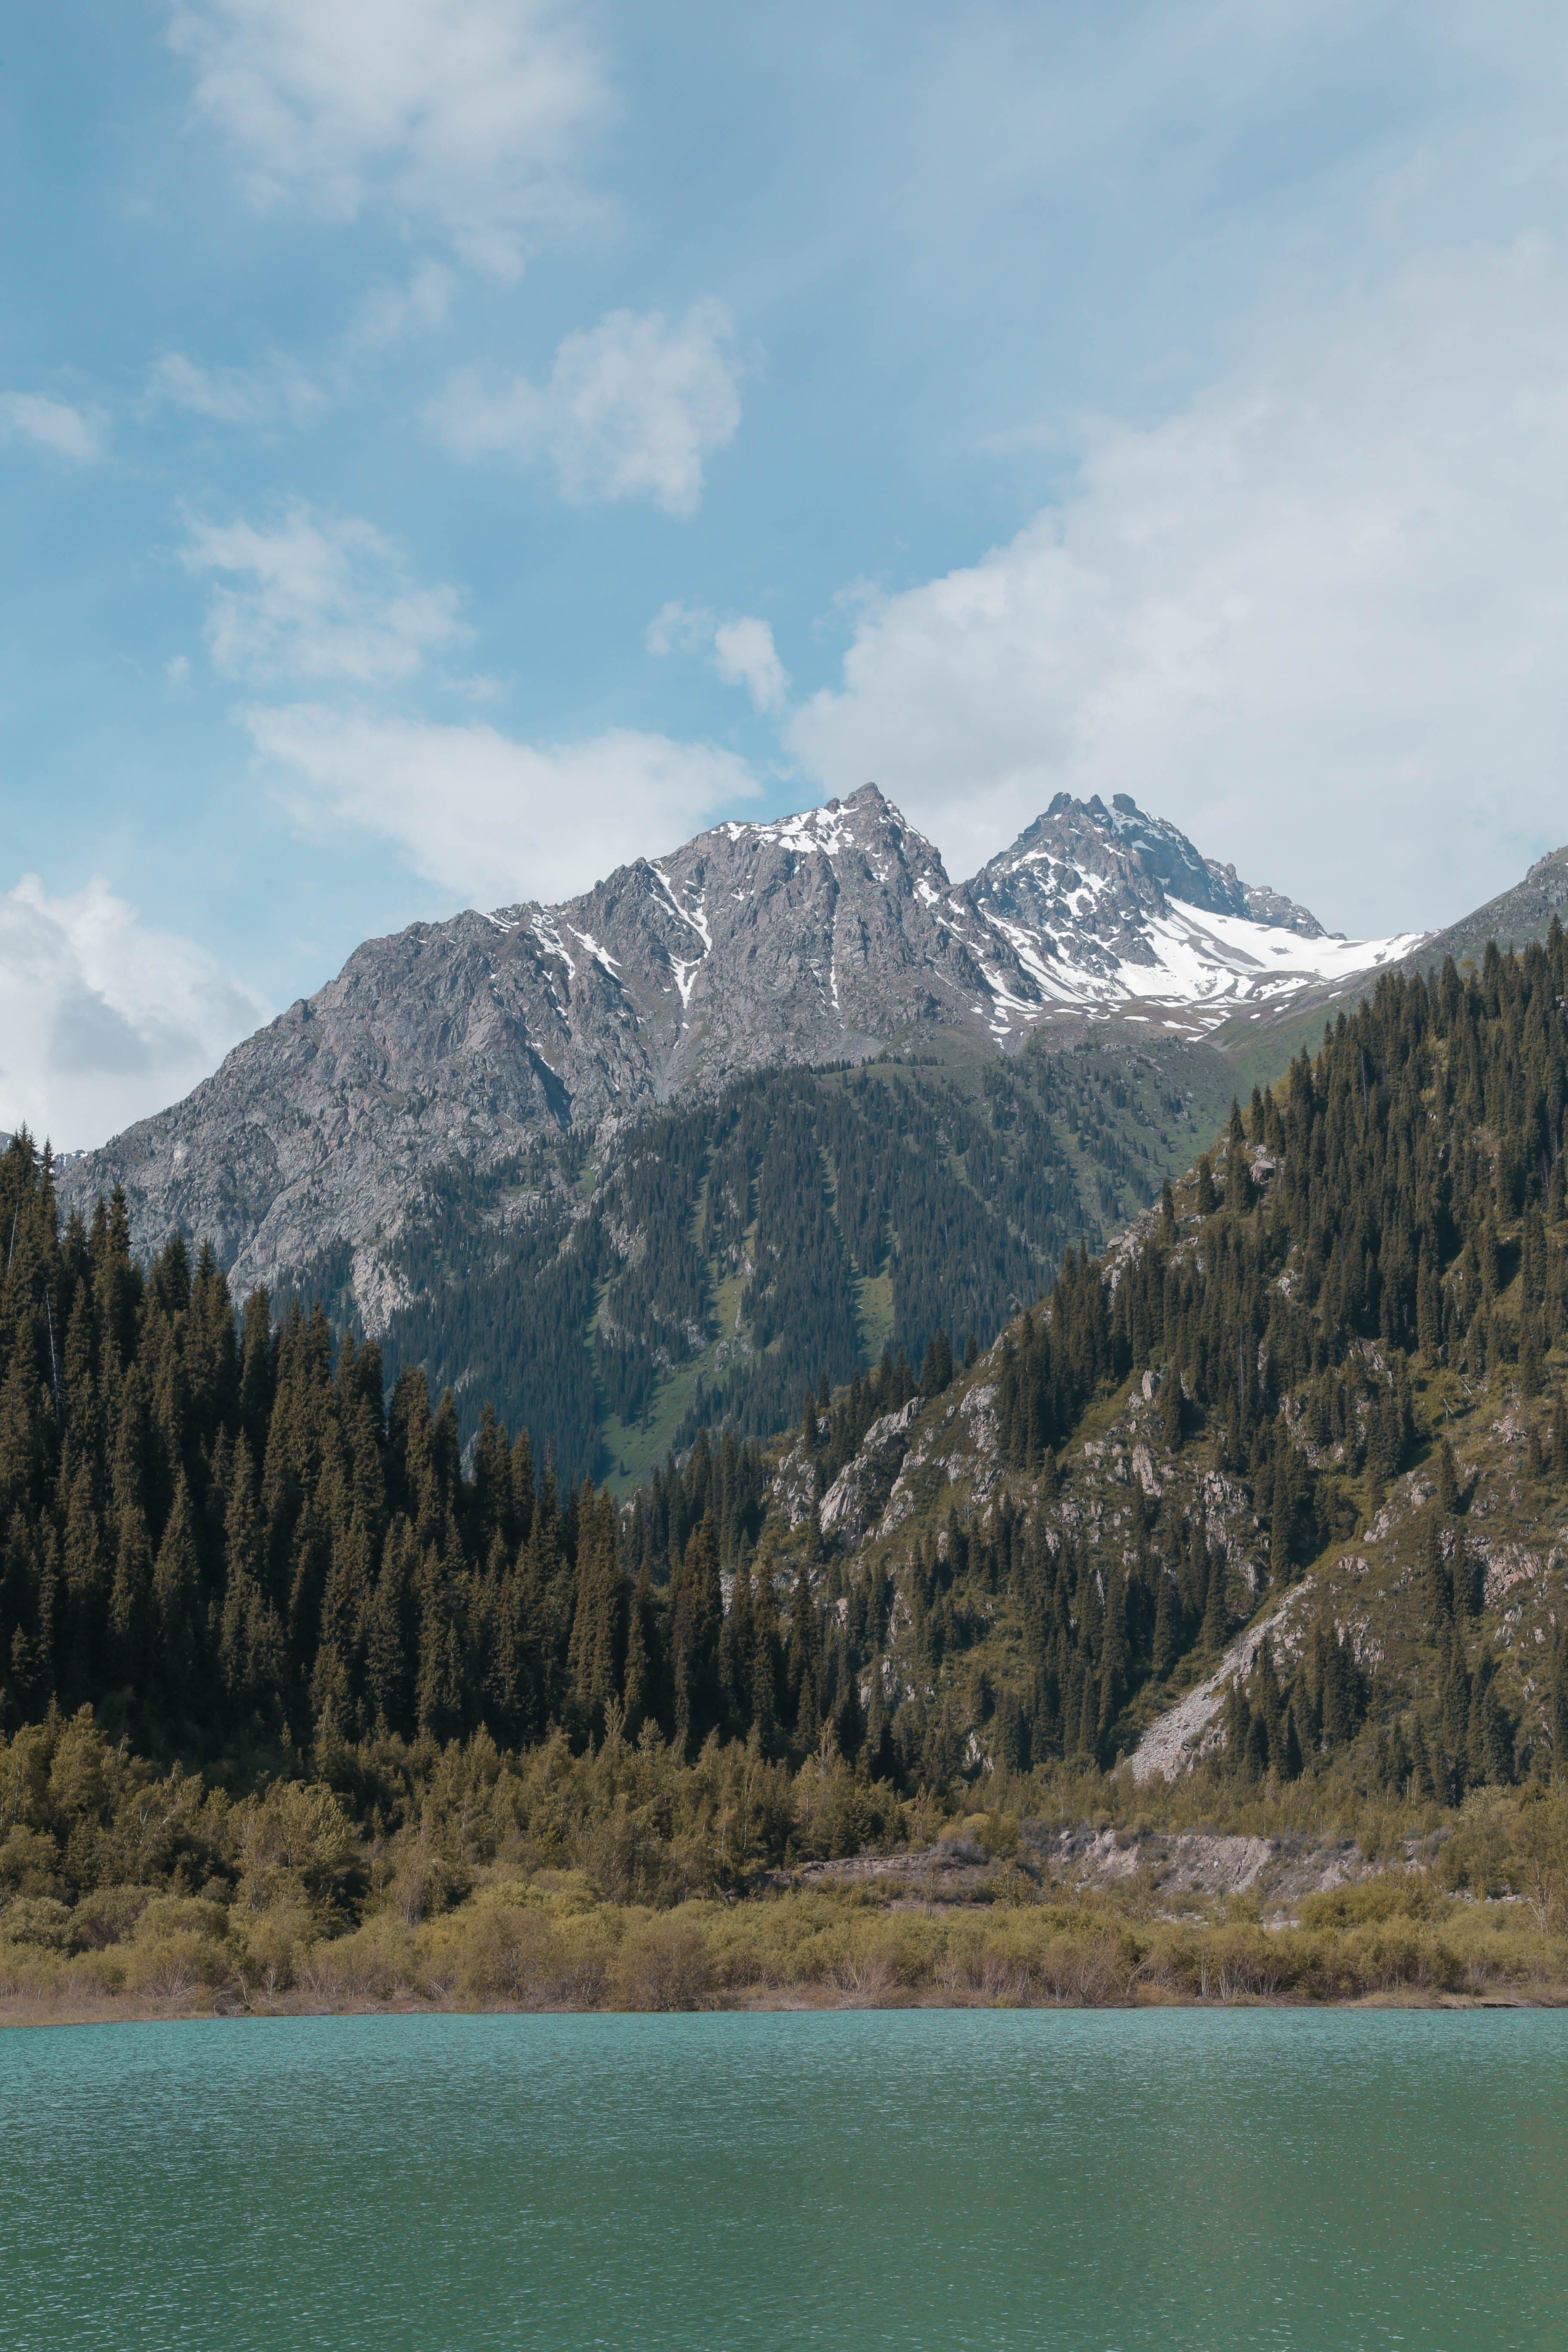 Snowcaps Mountain Near Body of Water